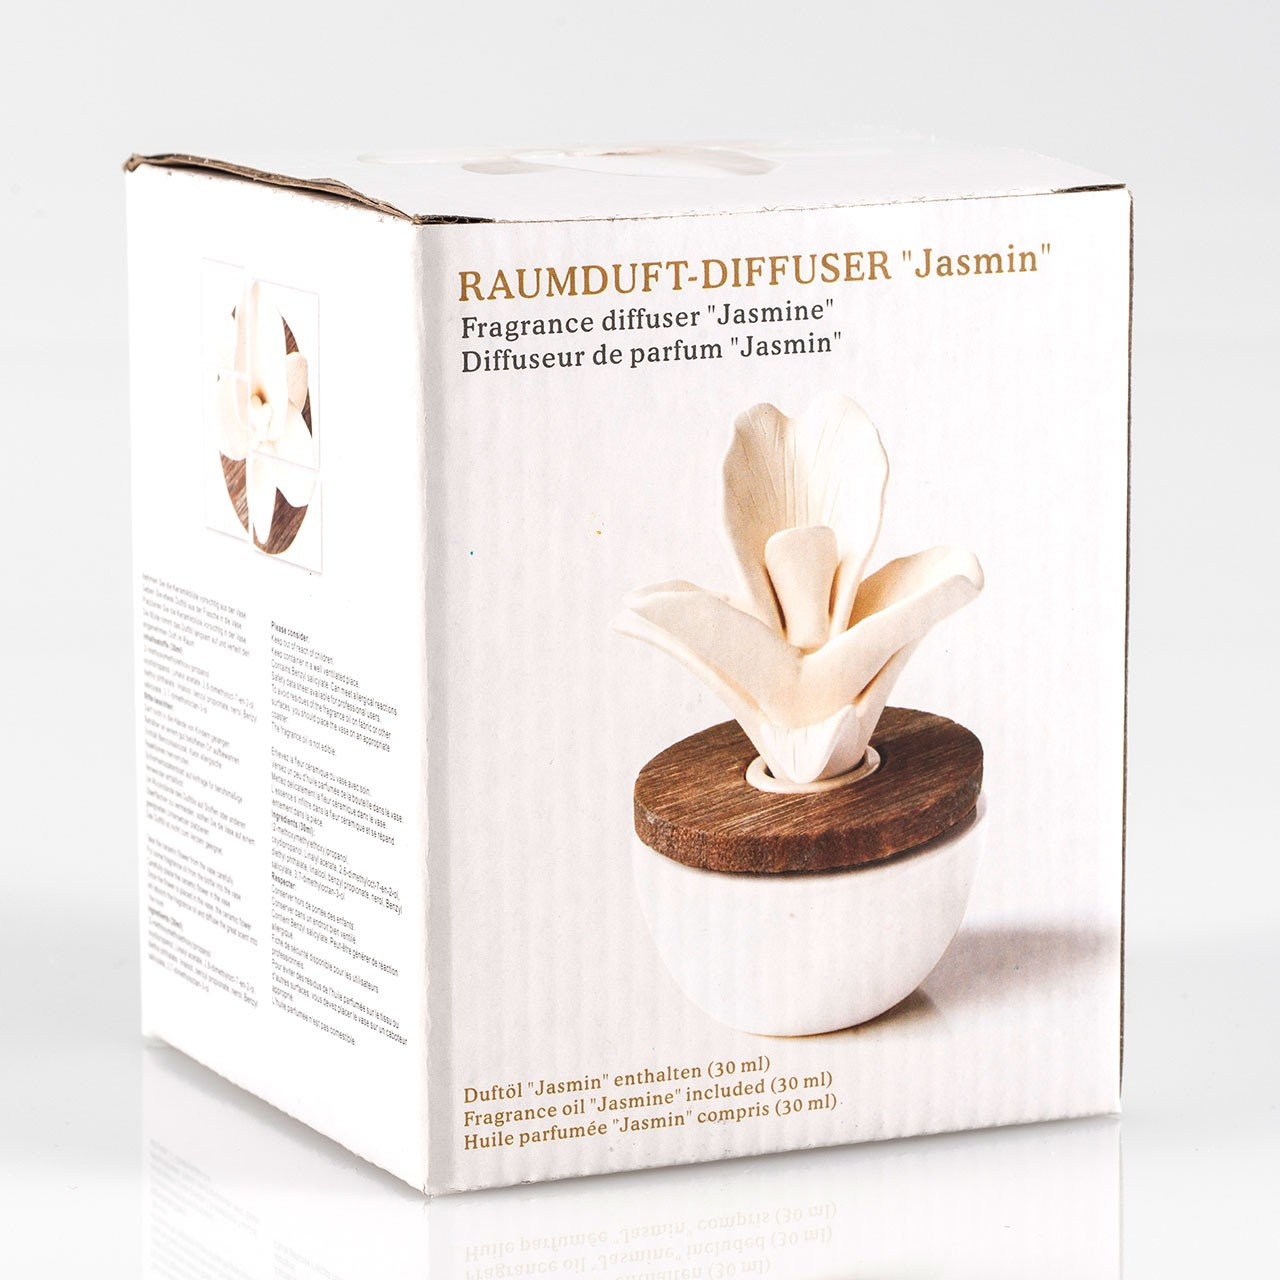 Pajoma Raumduft Jasmin Mit Keramikblüte: Amazon.de: Küche U0026 Haushalt